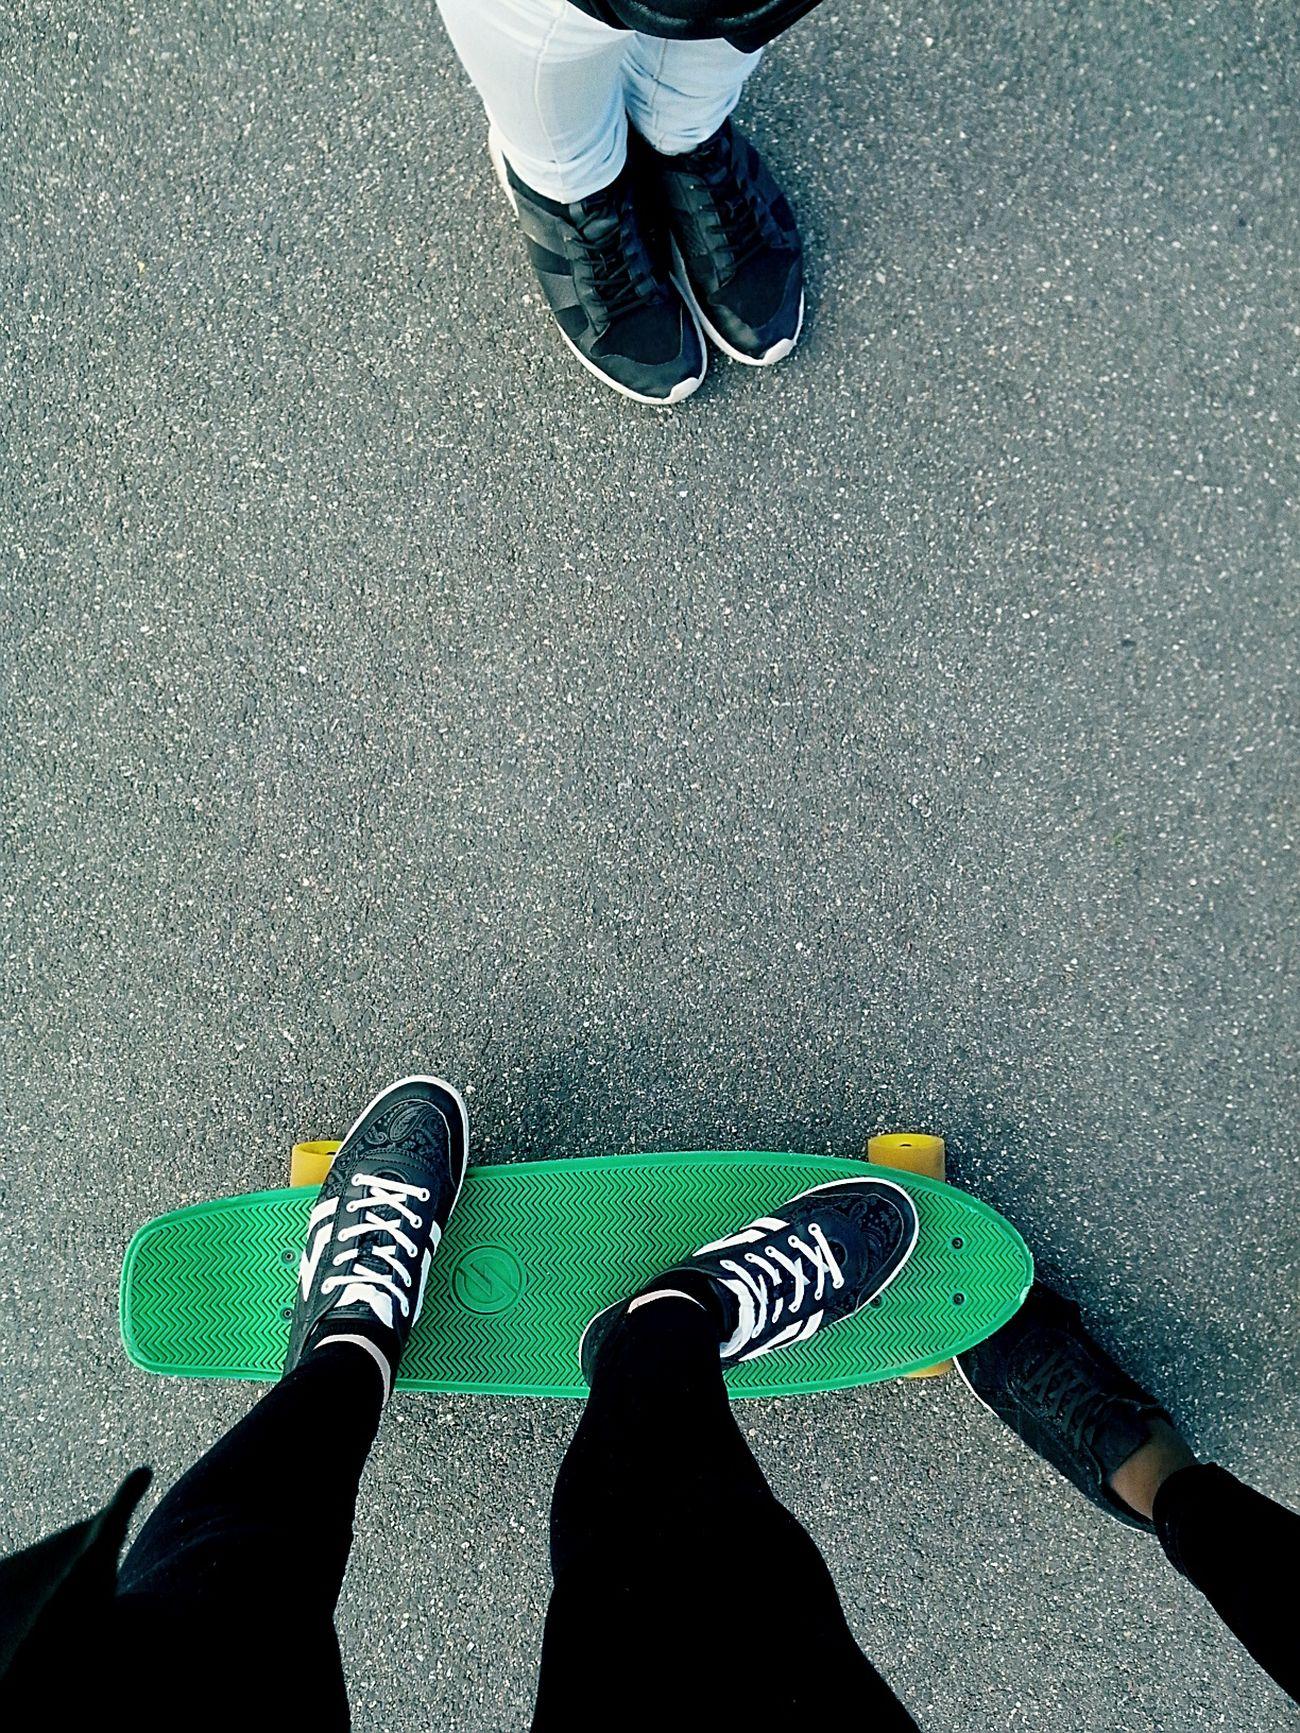 Friends Skate Skateboarding WDGAF Sunny Street City